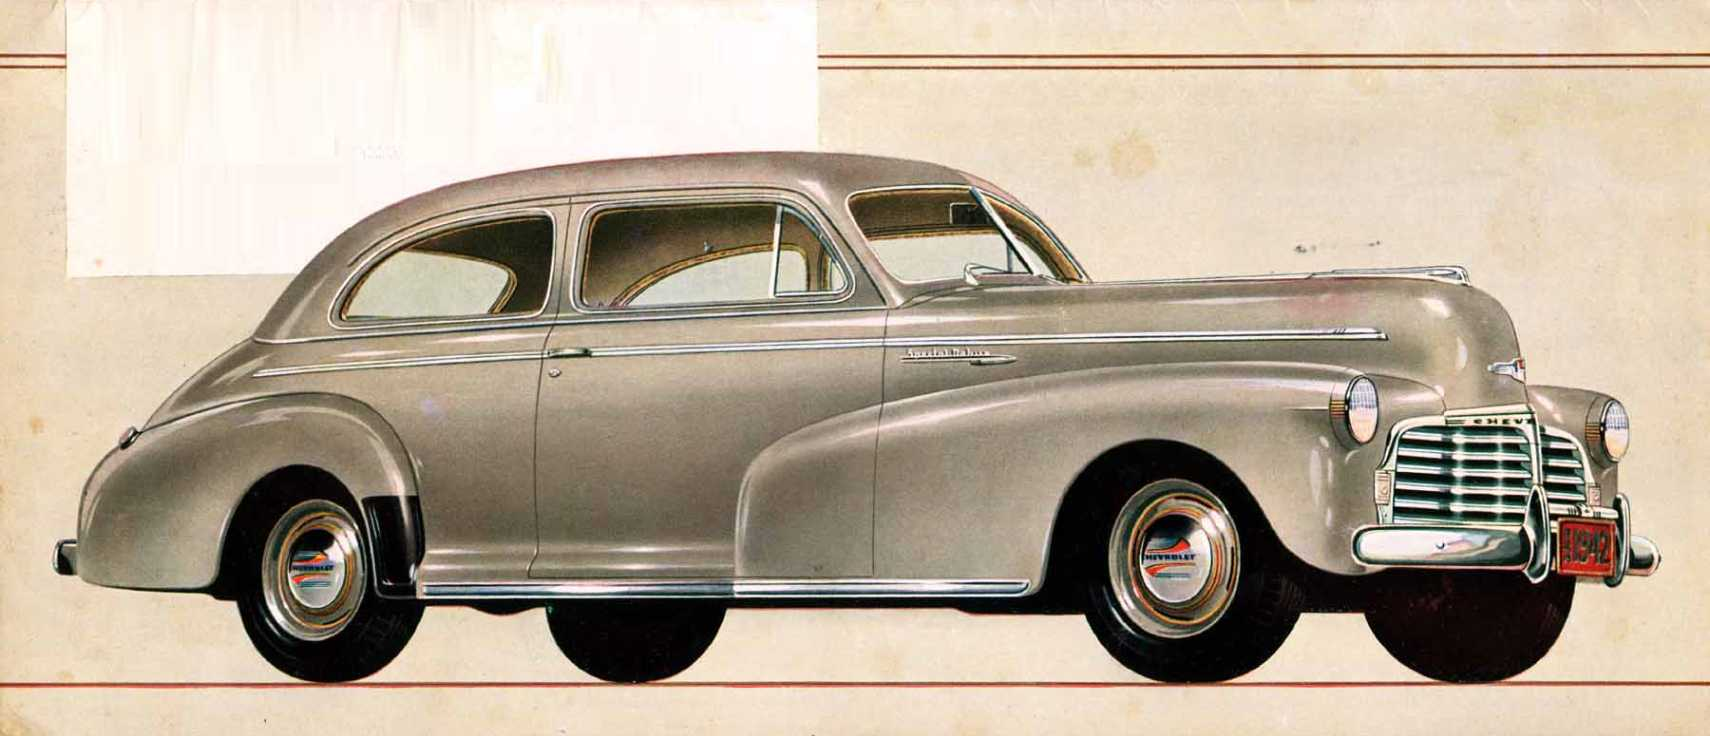 Chevrolet Special Deluxe Town Sedan 3.5 Manual, 91hp, 1942